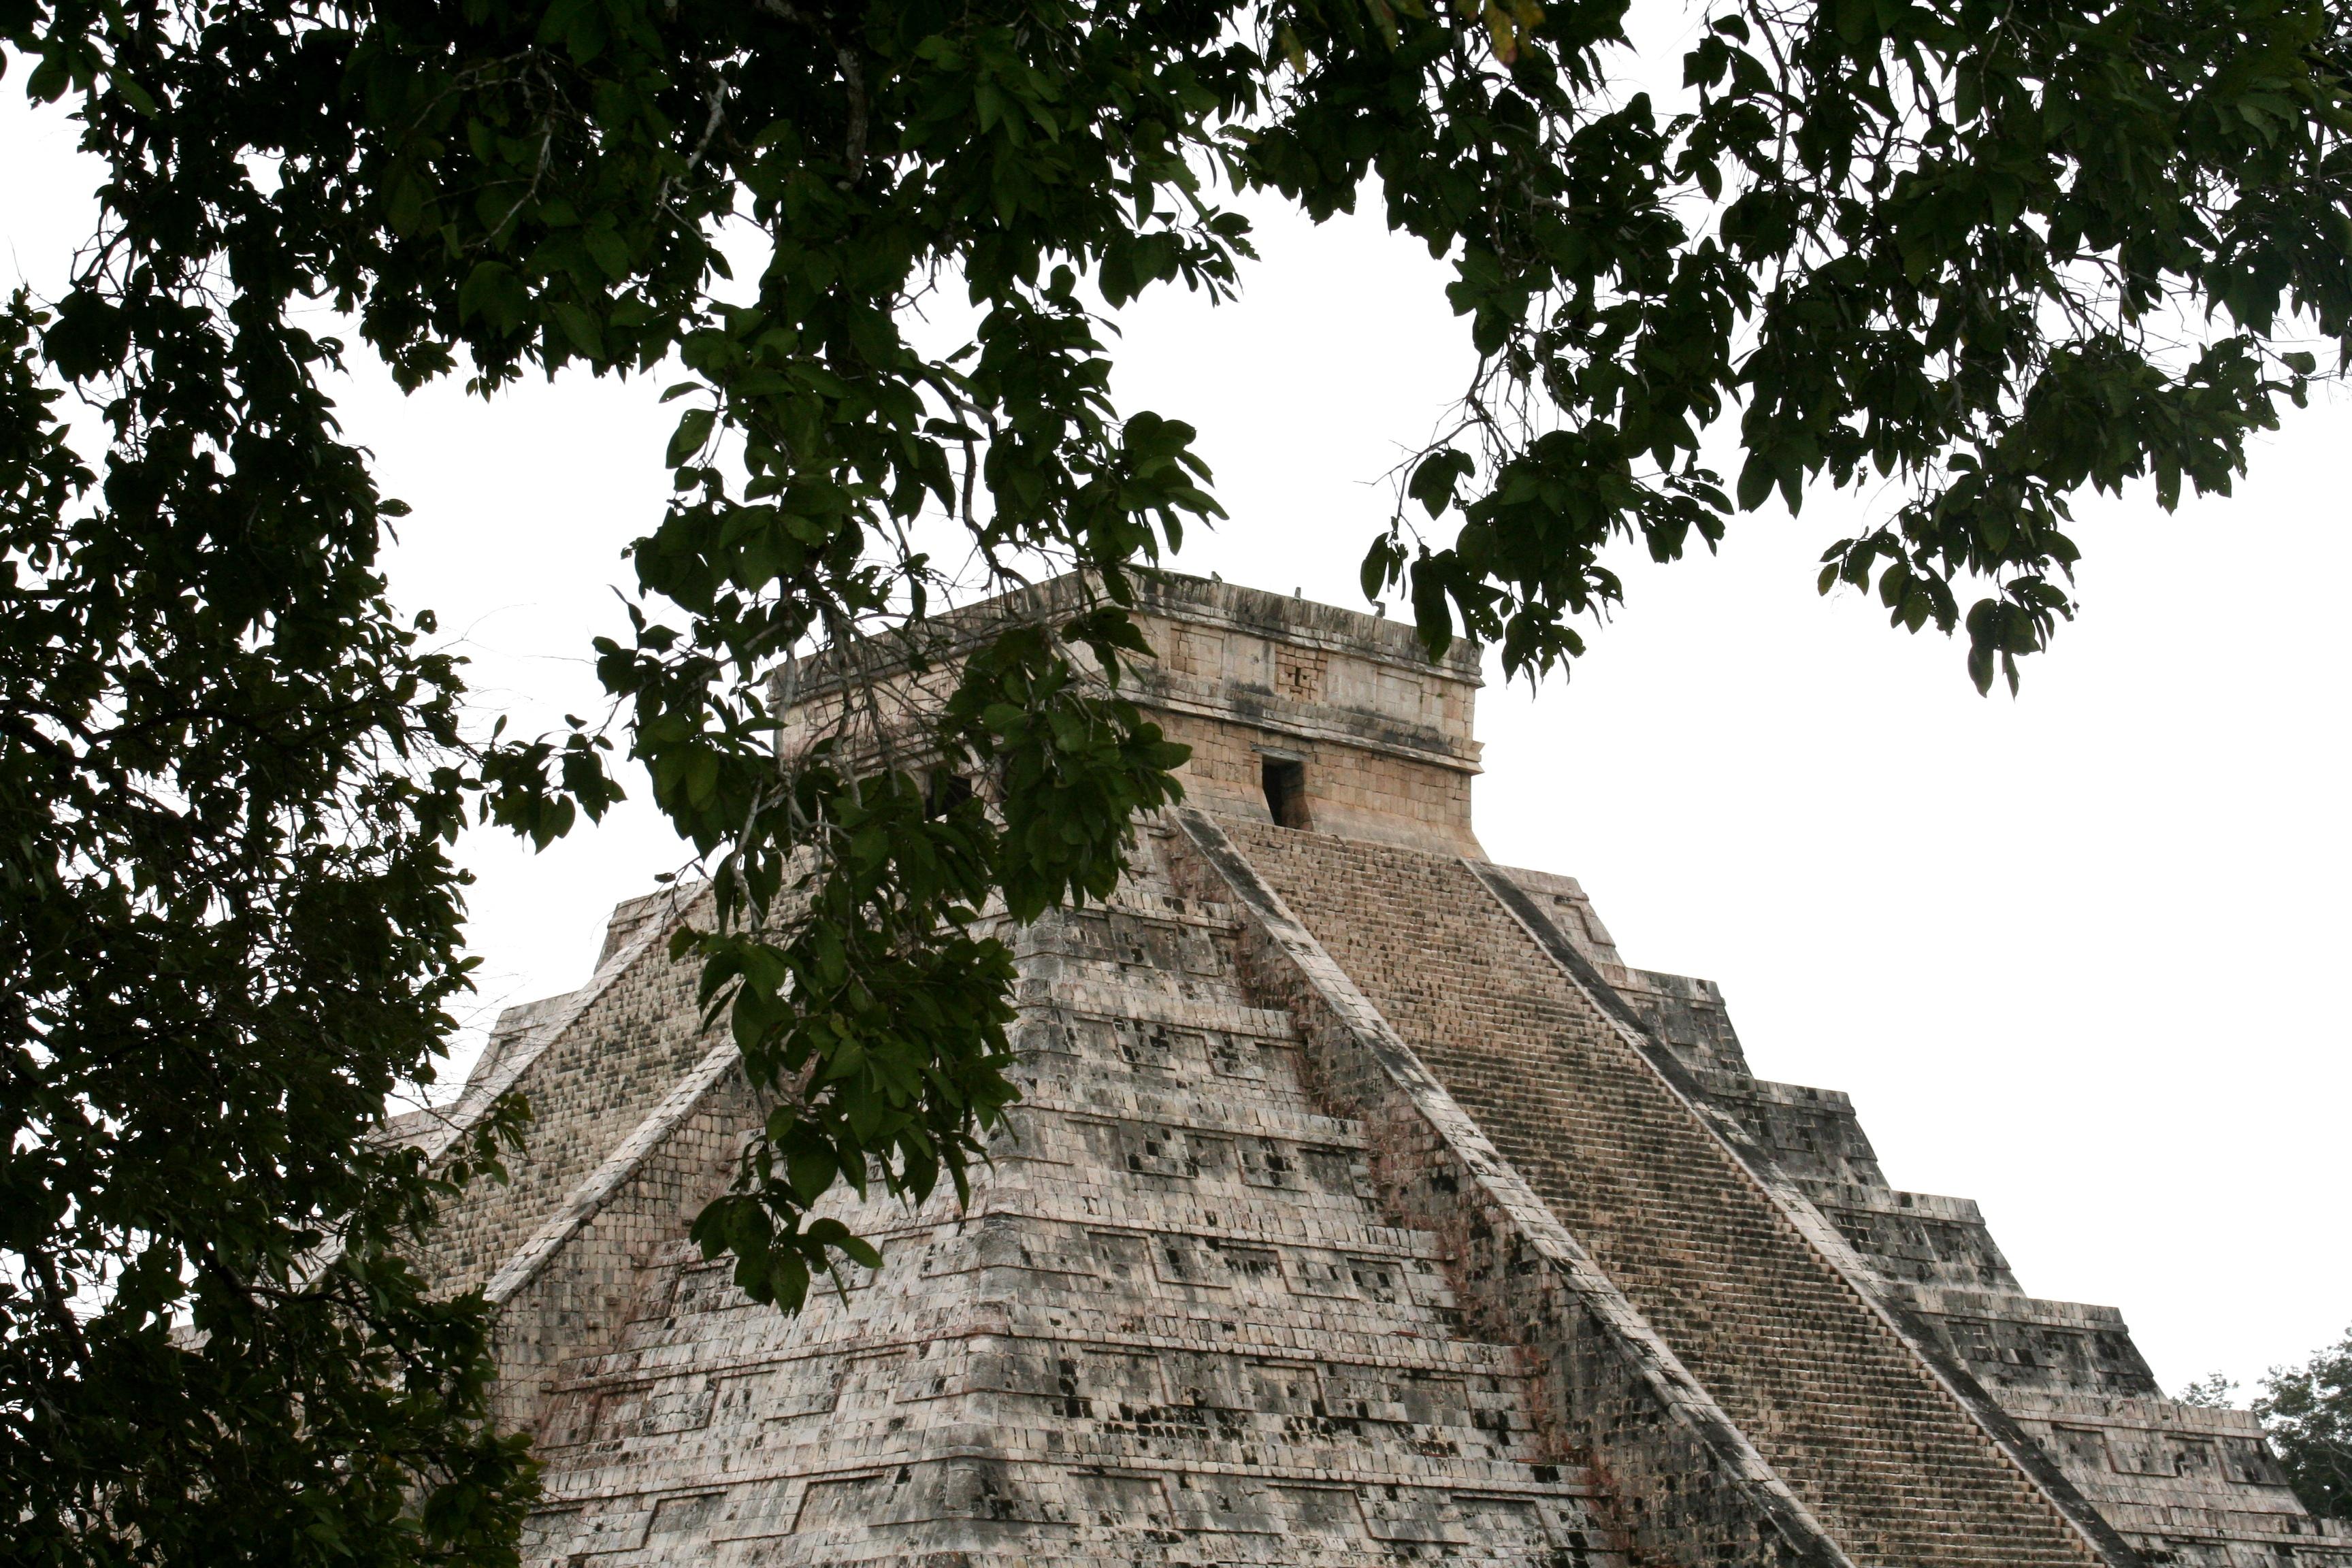 Mayan Stairway to Heaven